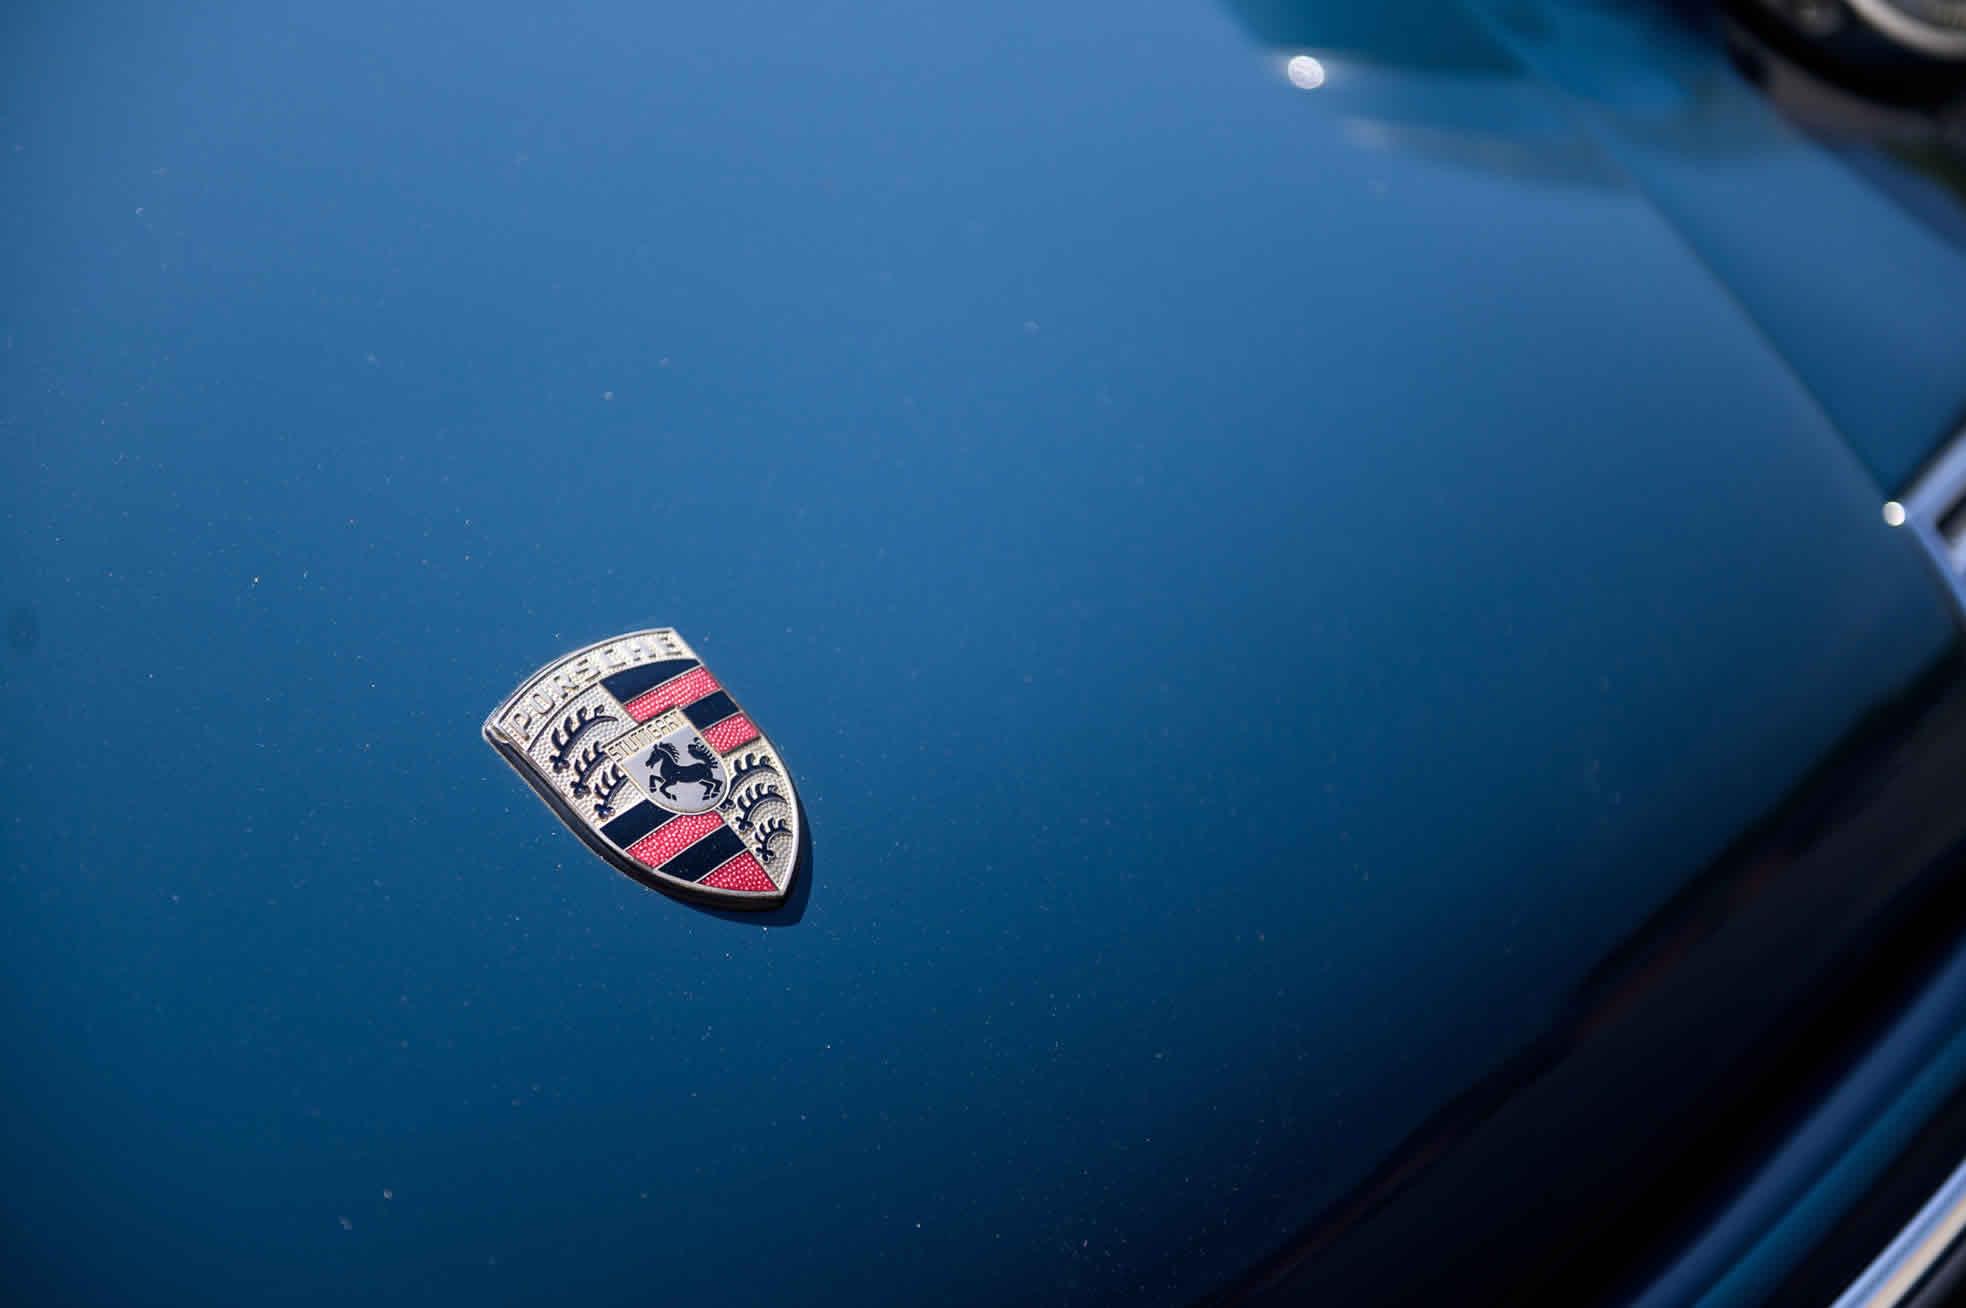 For sale 1966 Porsche 911. Sports Purpose, Bicester Heritage